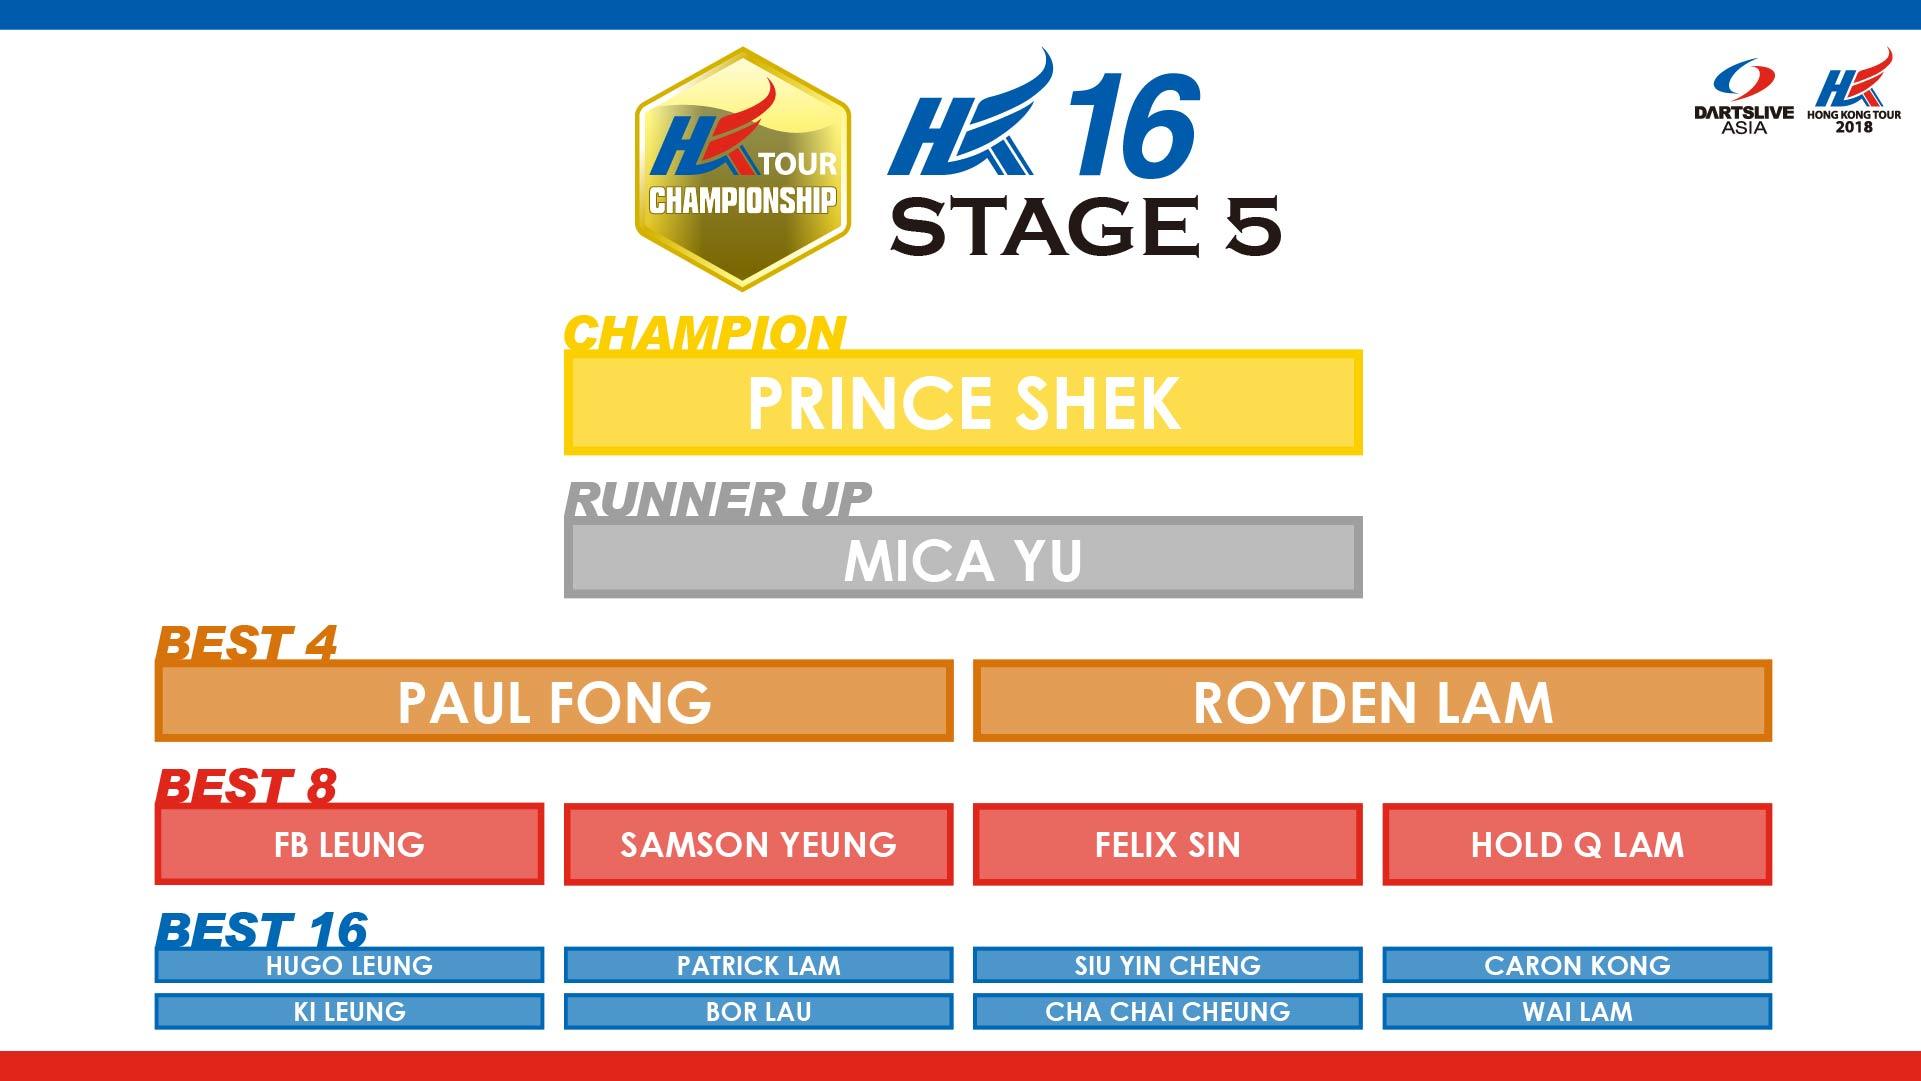 HKTCS 2018 STAGE 5 hk16 RESULT